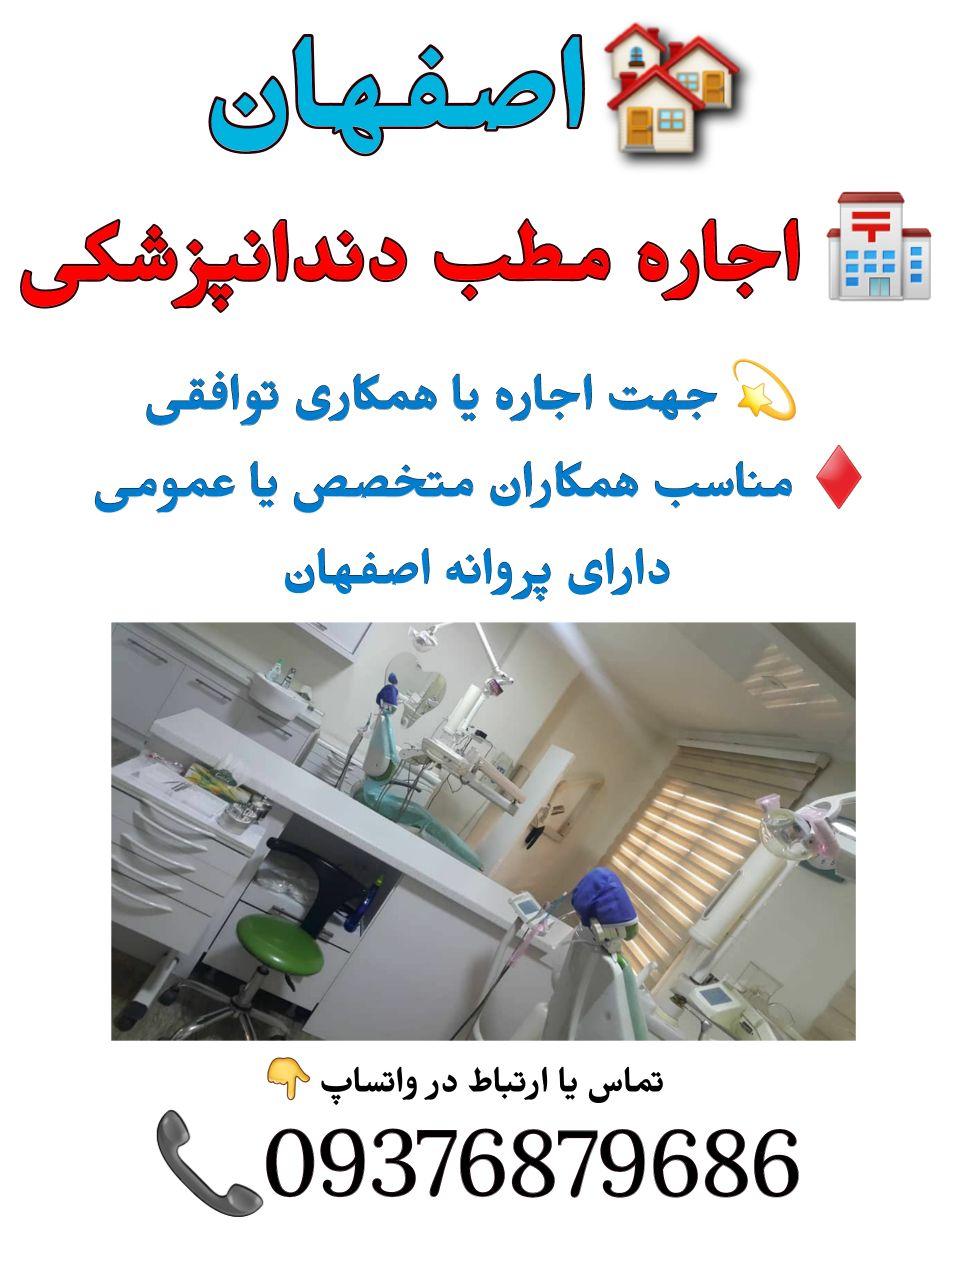 اصفهان: اجاره مطب دندانپزشکی